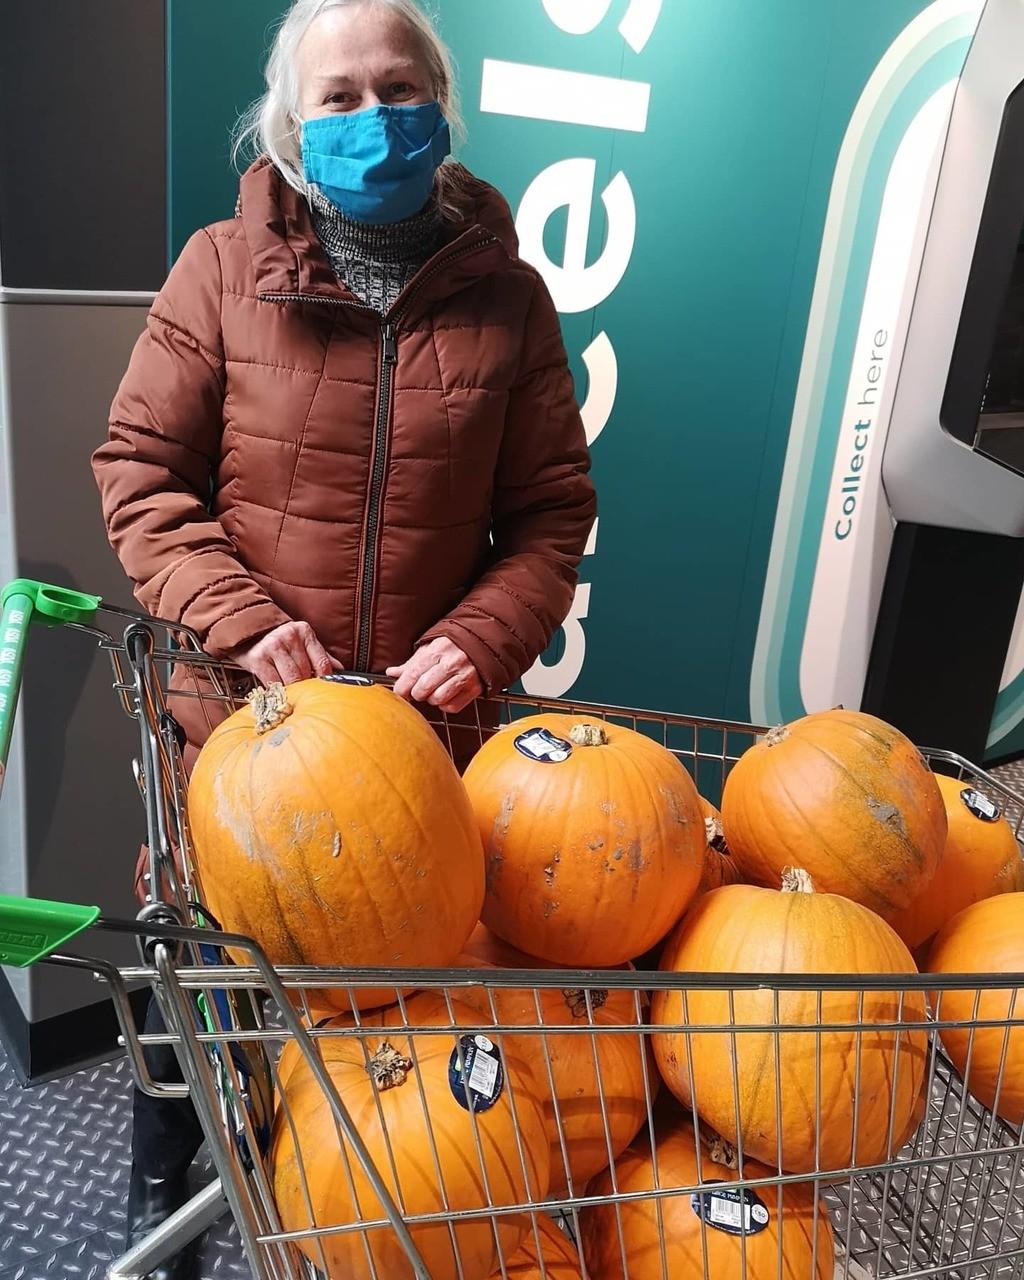 Smashing pumpkins | Asda Elgin